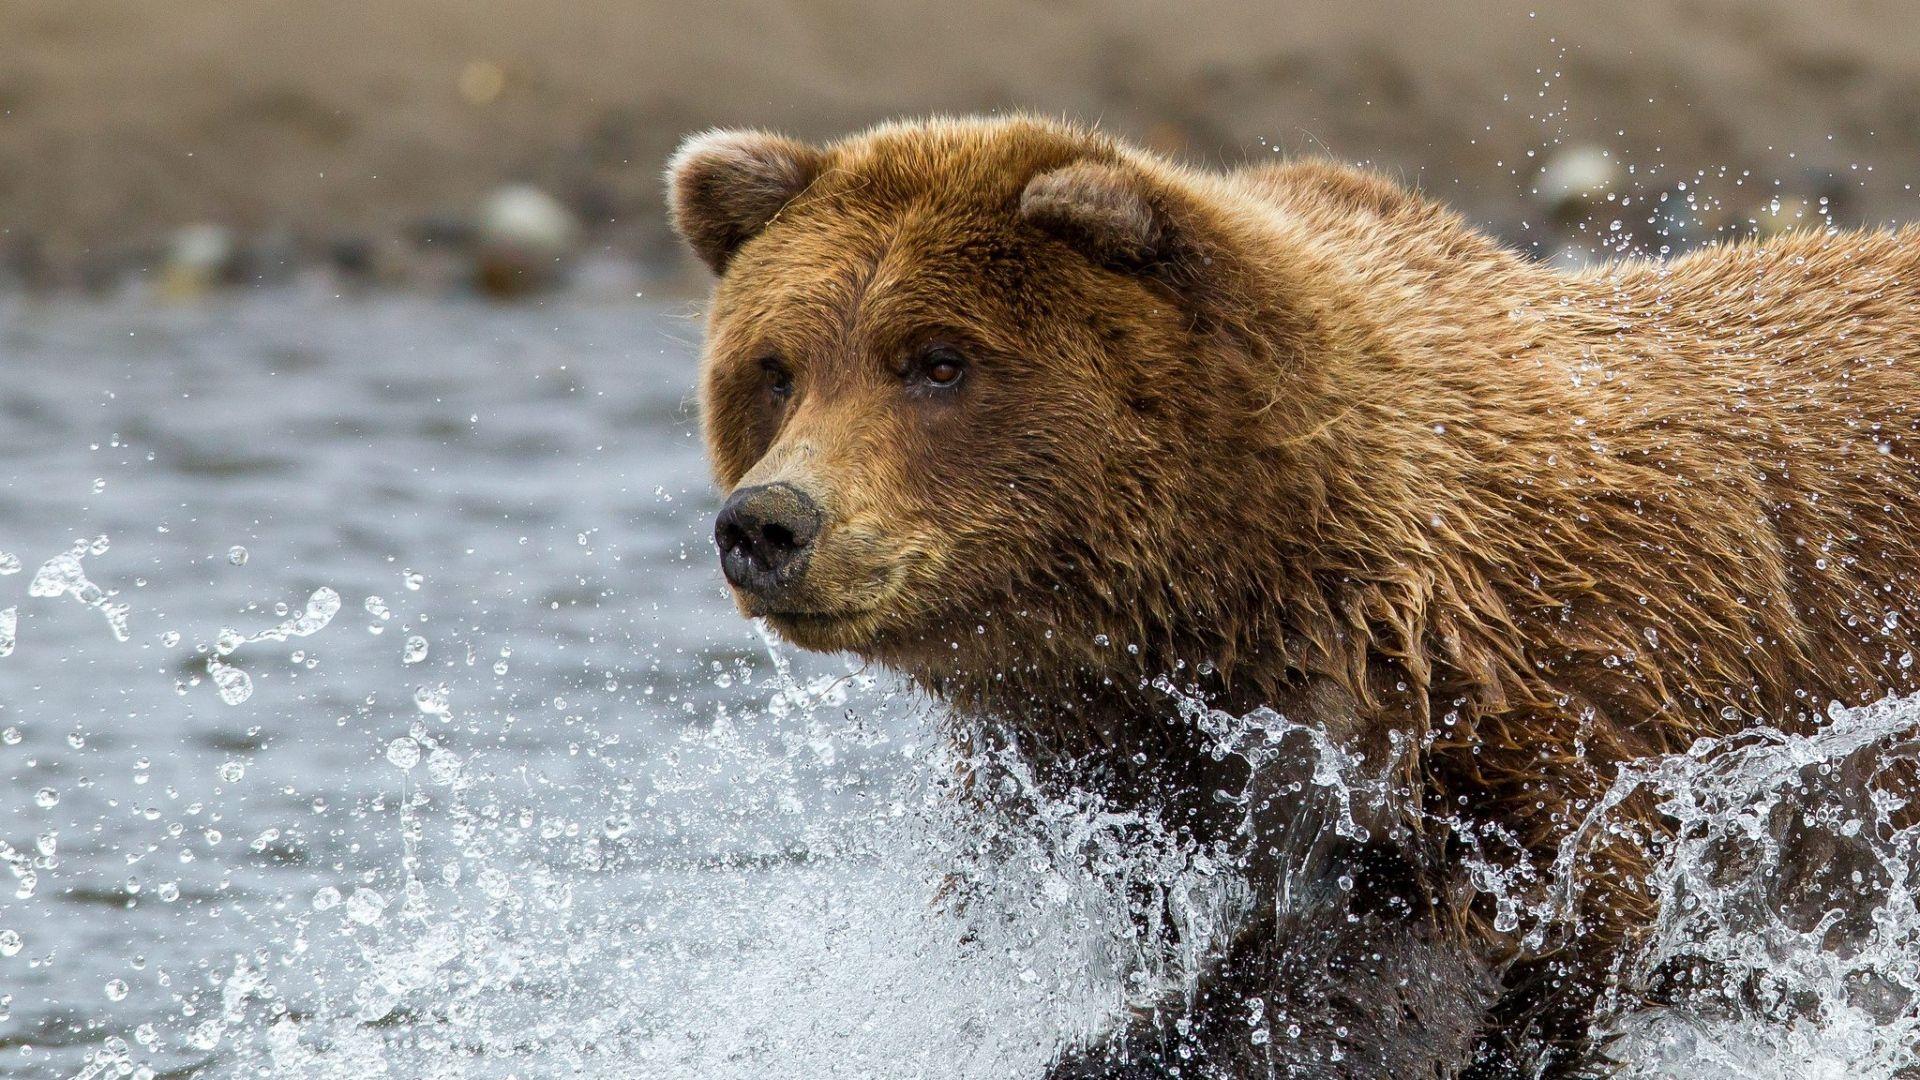 Brown Bear Water Spray Wallpaper